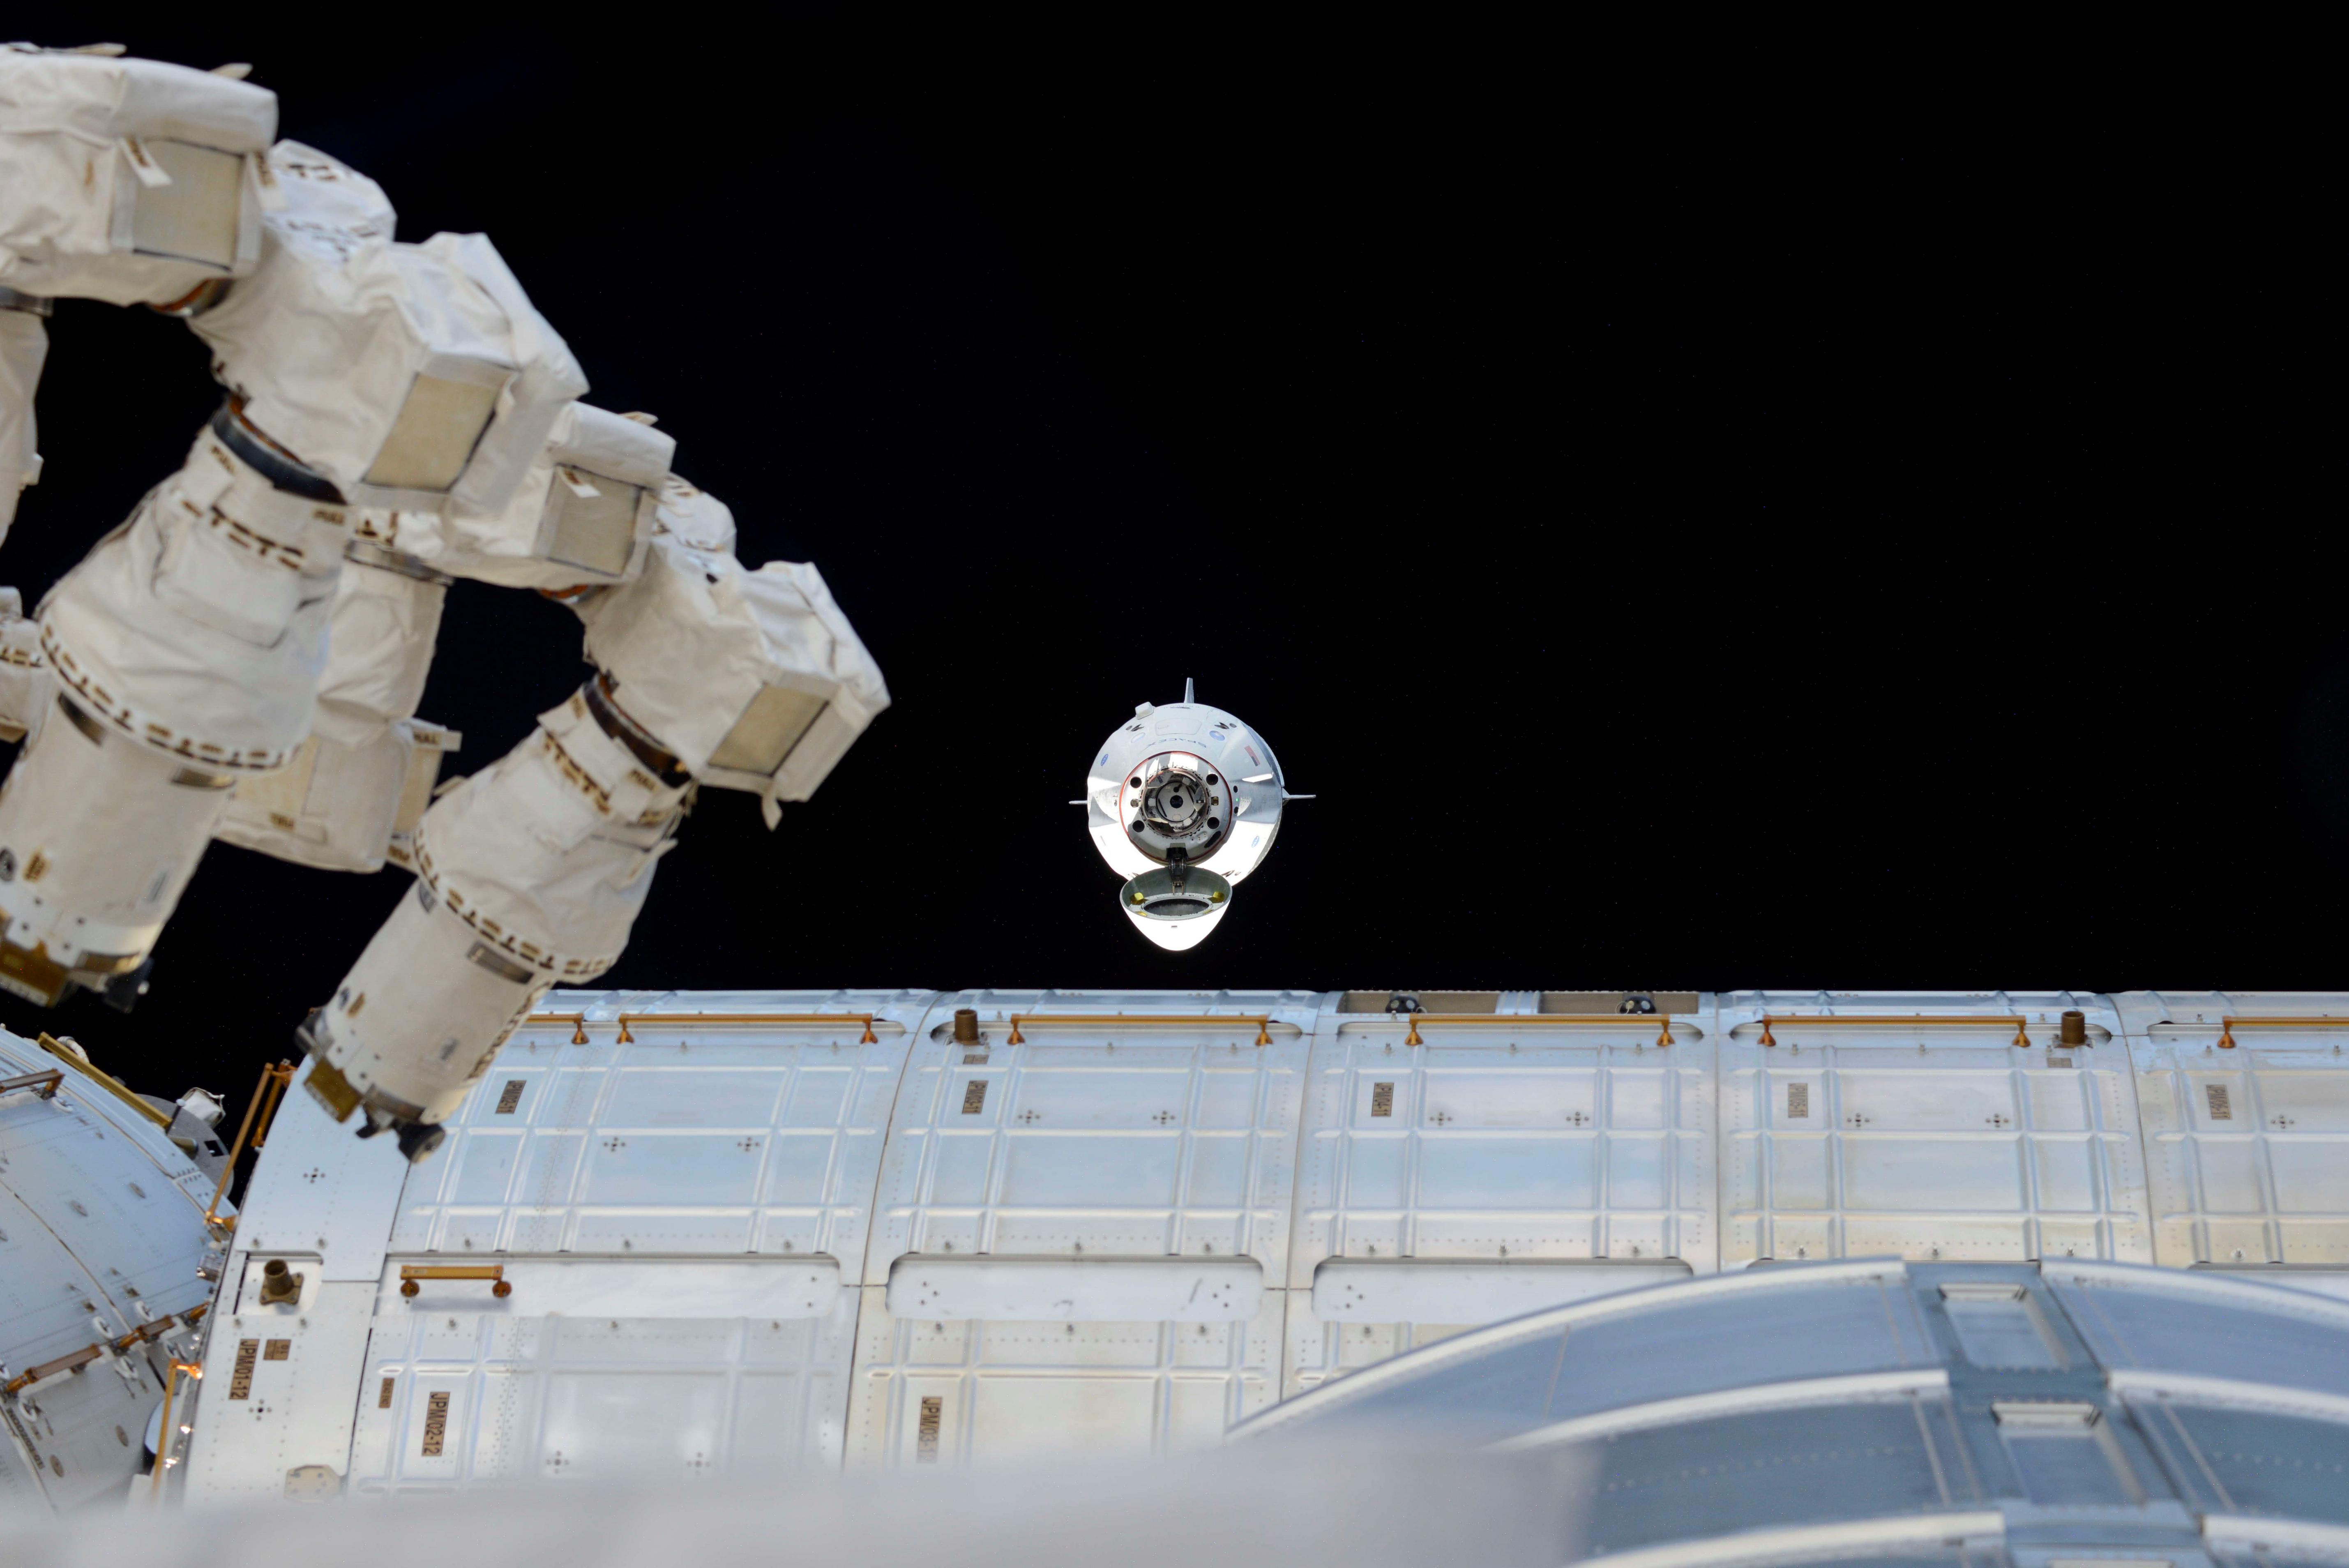 Crew Dragon DM-1 ISS arrival 030319 (Oleg Kononenko) 1 (c)